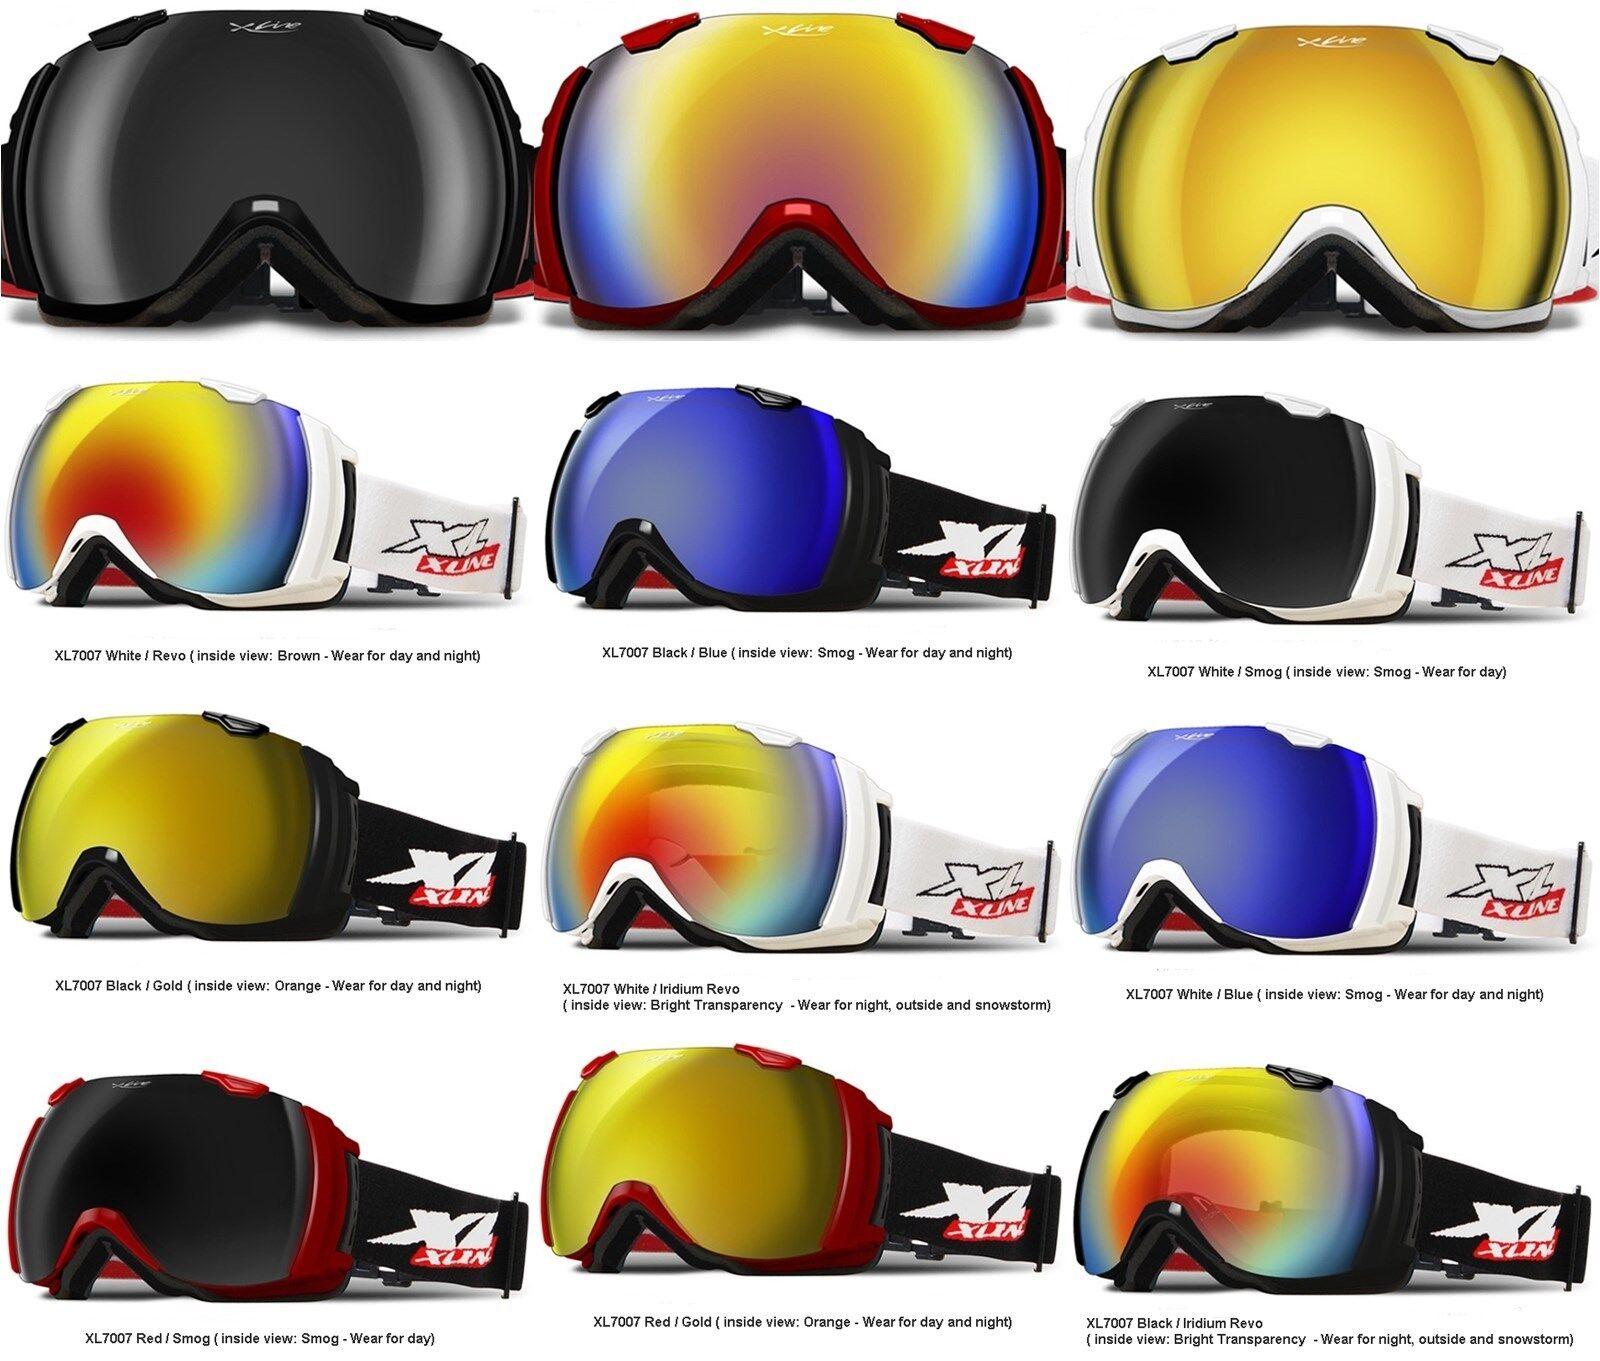 XLINE XL7007 Goggles SKI SNOWBOARD Snow OVERLENS Wide Mirrored Big UV Snowstorm